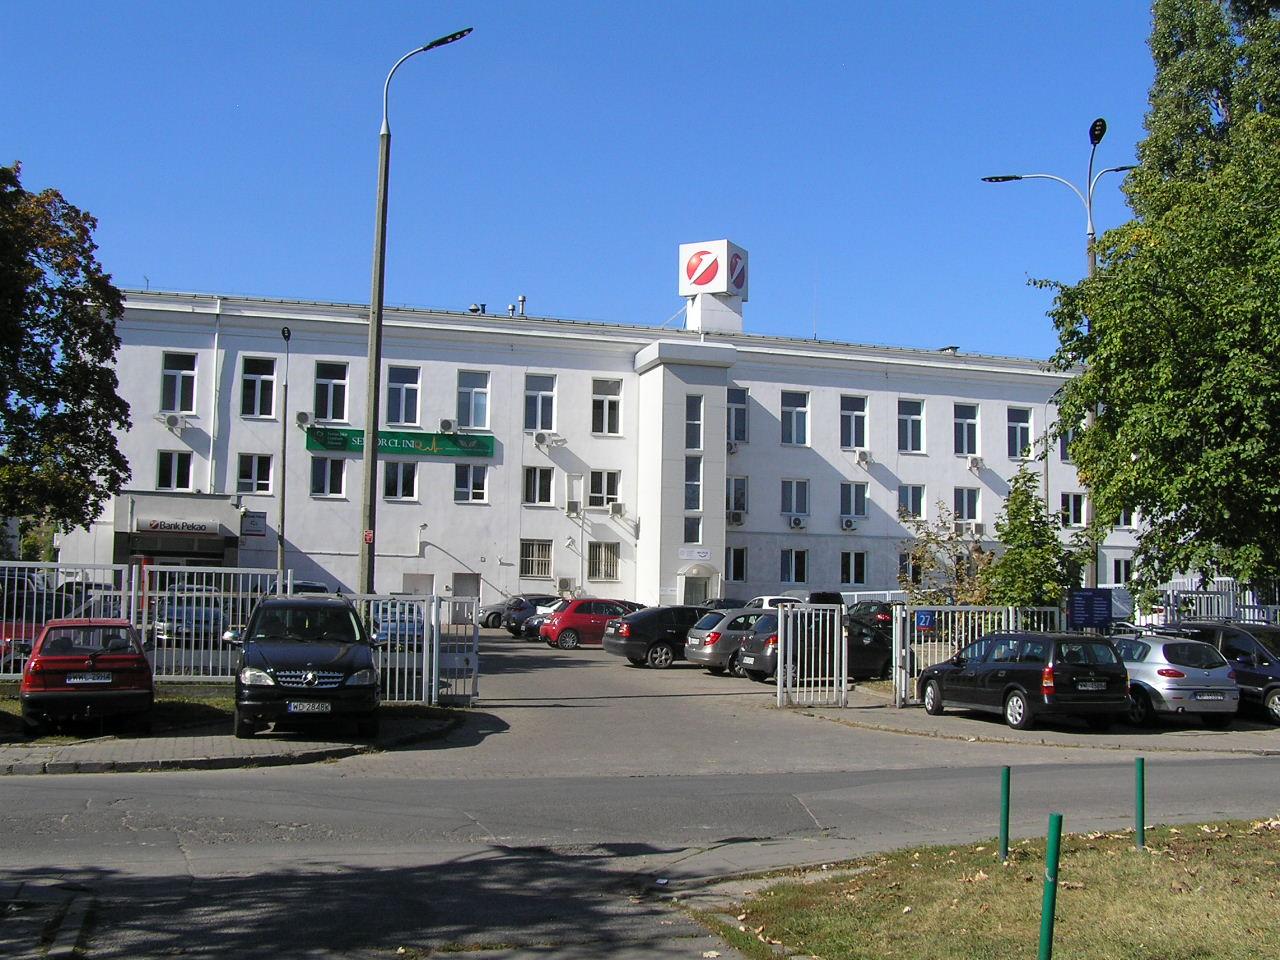 Omulewska 27